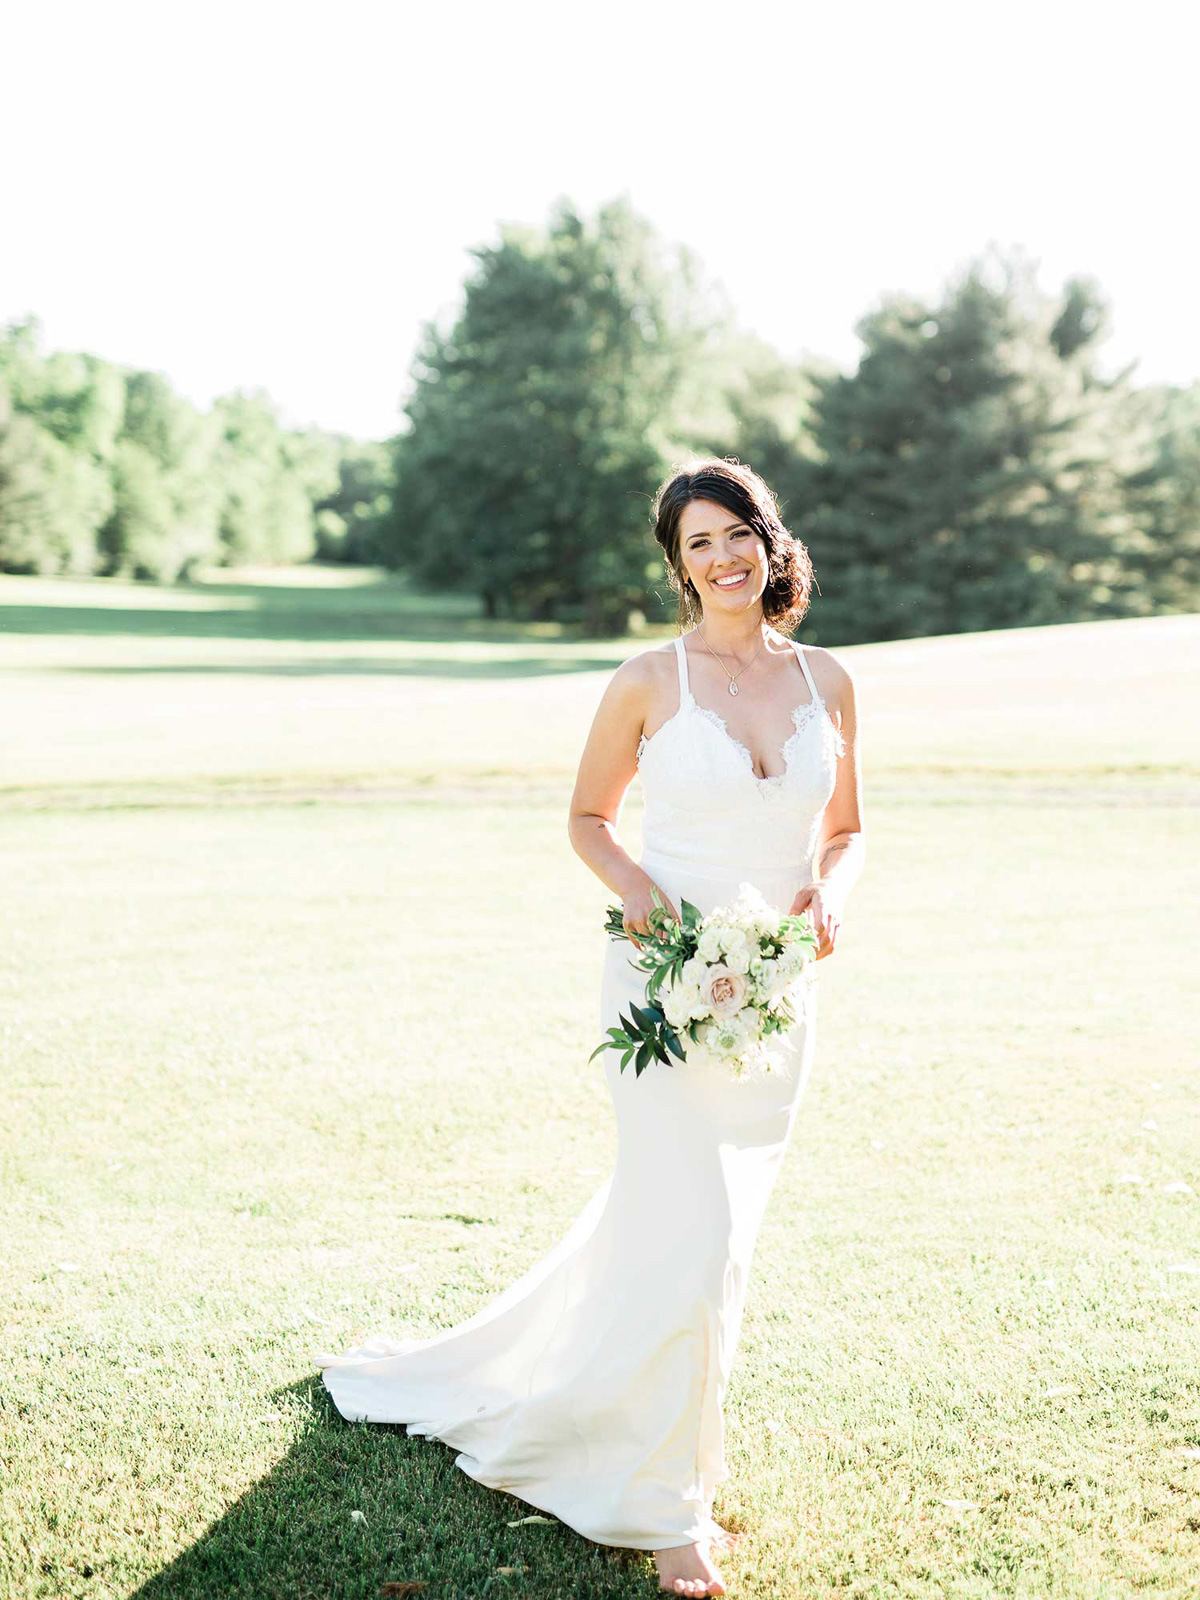 destiny-dawn-photography-vineyard-bride-swish-list-knollwood-golf-and-country-club-ancaster-wedding-editorial-23.jpg